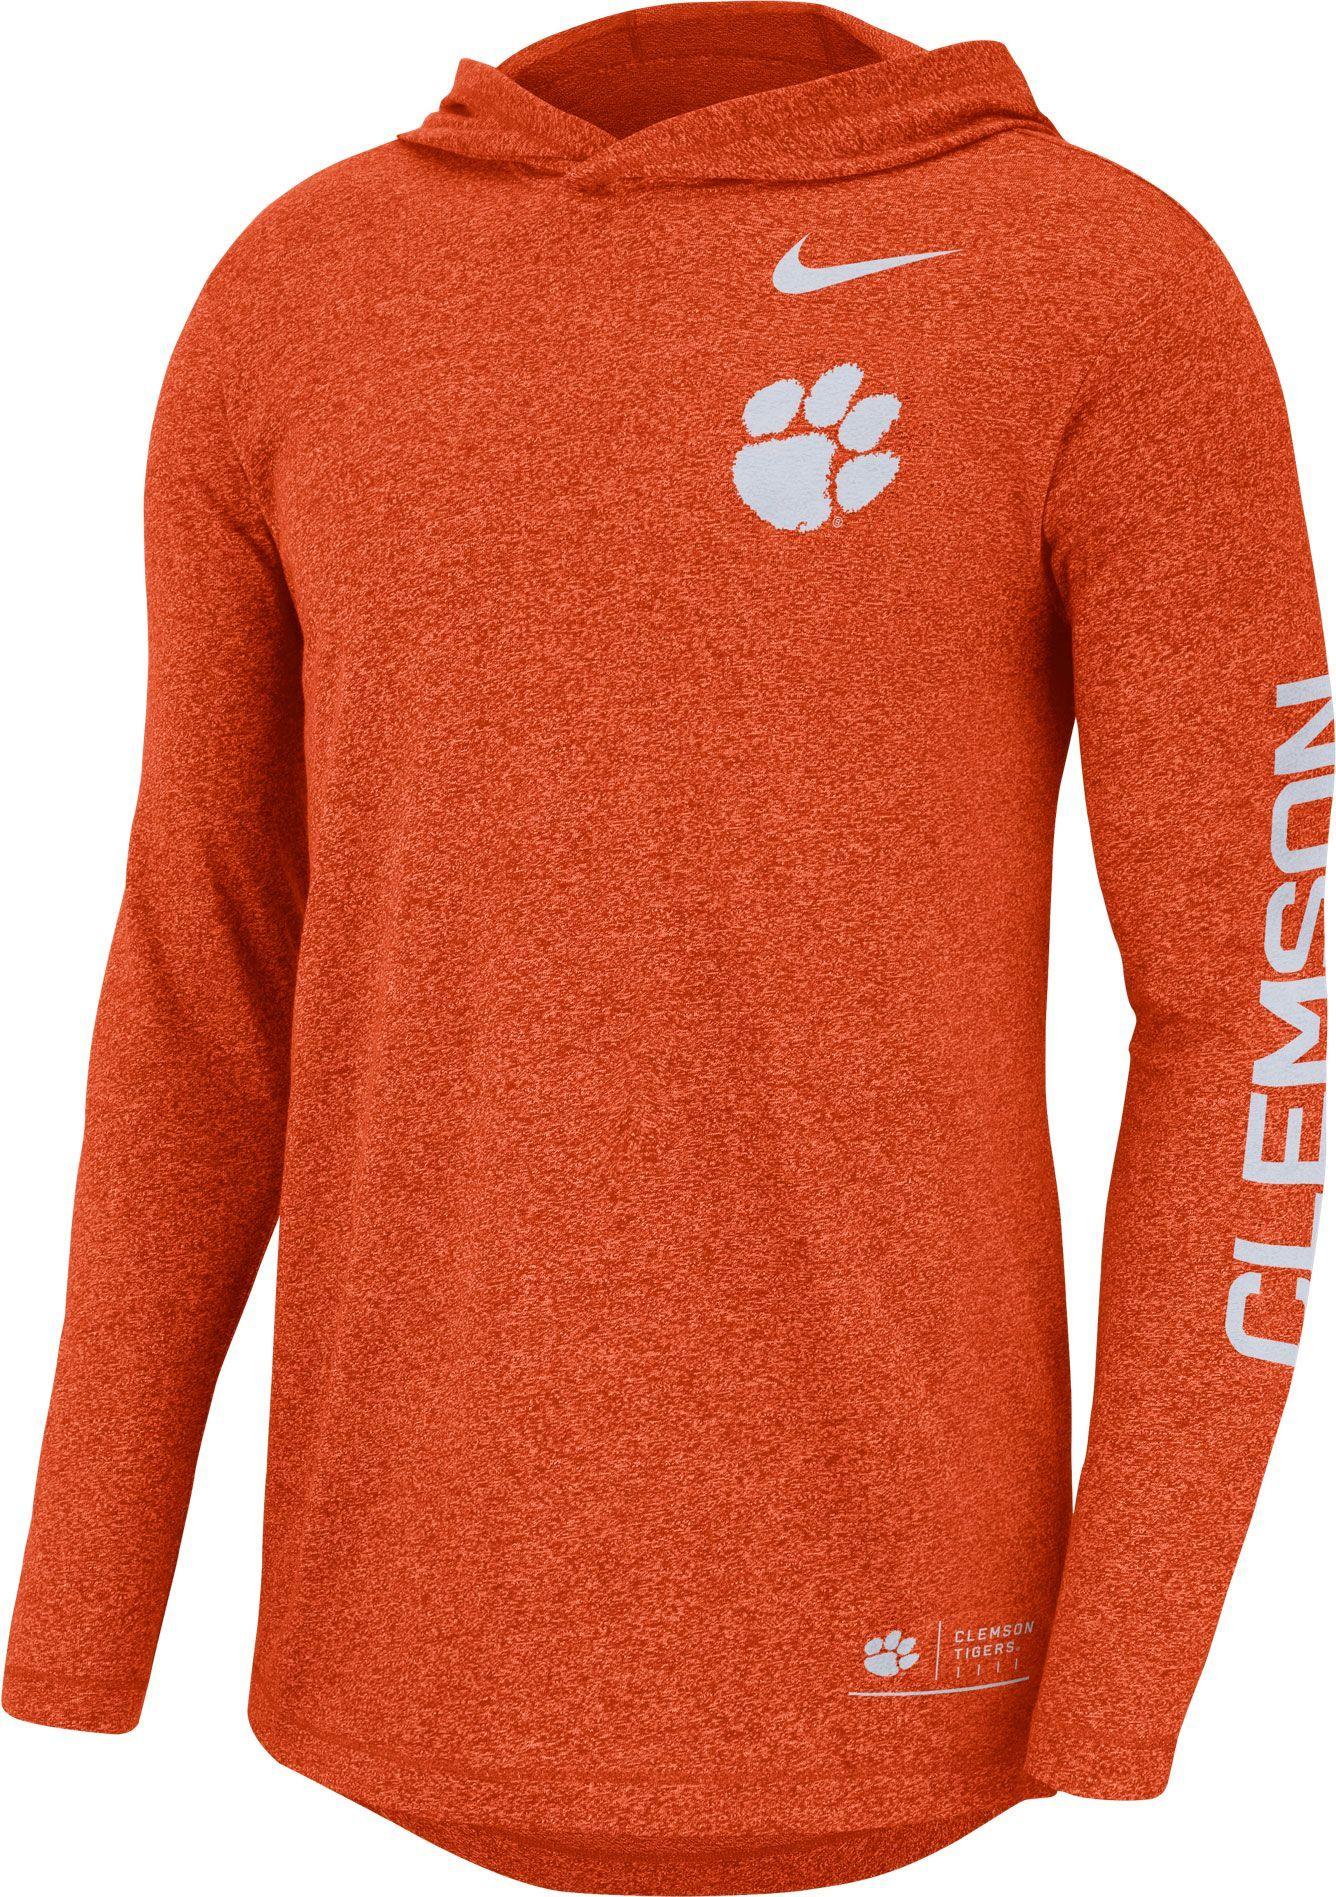 e5e380e7d Nike Men's Clemson Tigers Orange Marled Long Sleeve Hooded Sideline T-Shirt